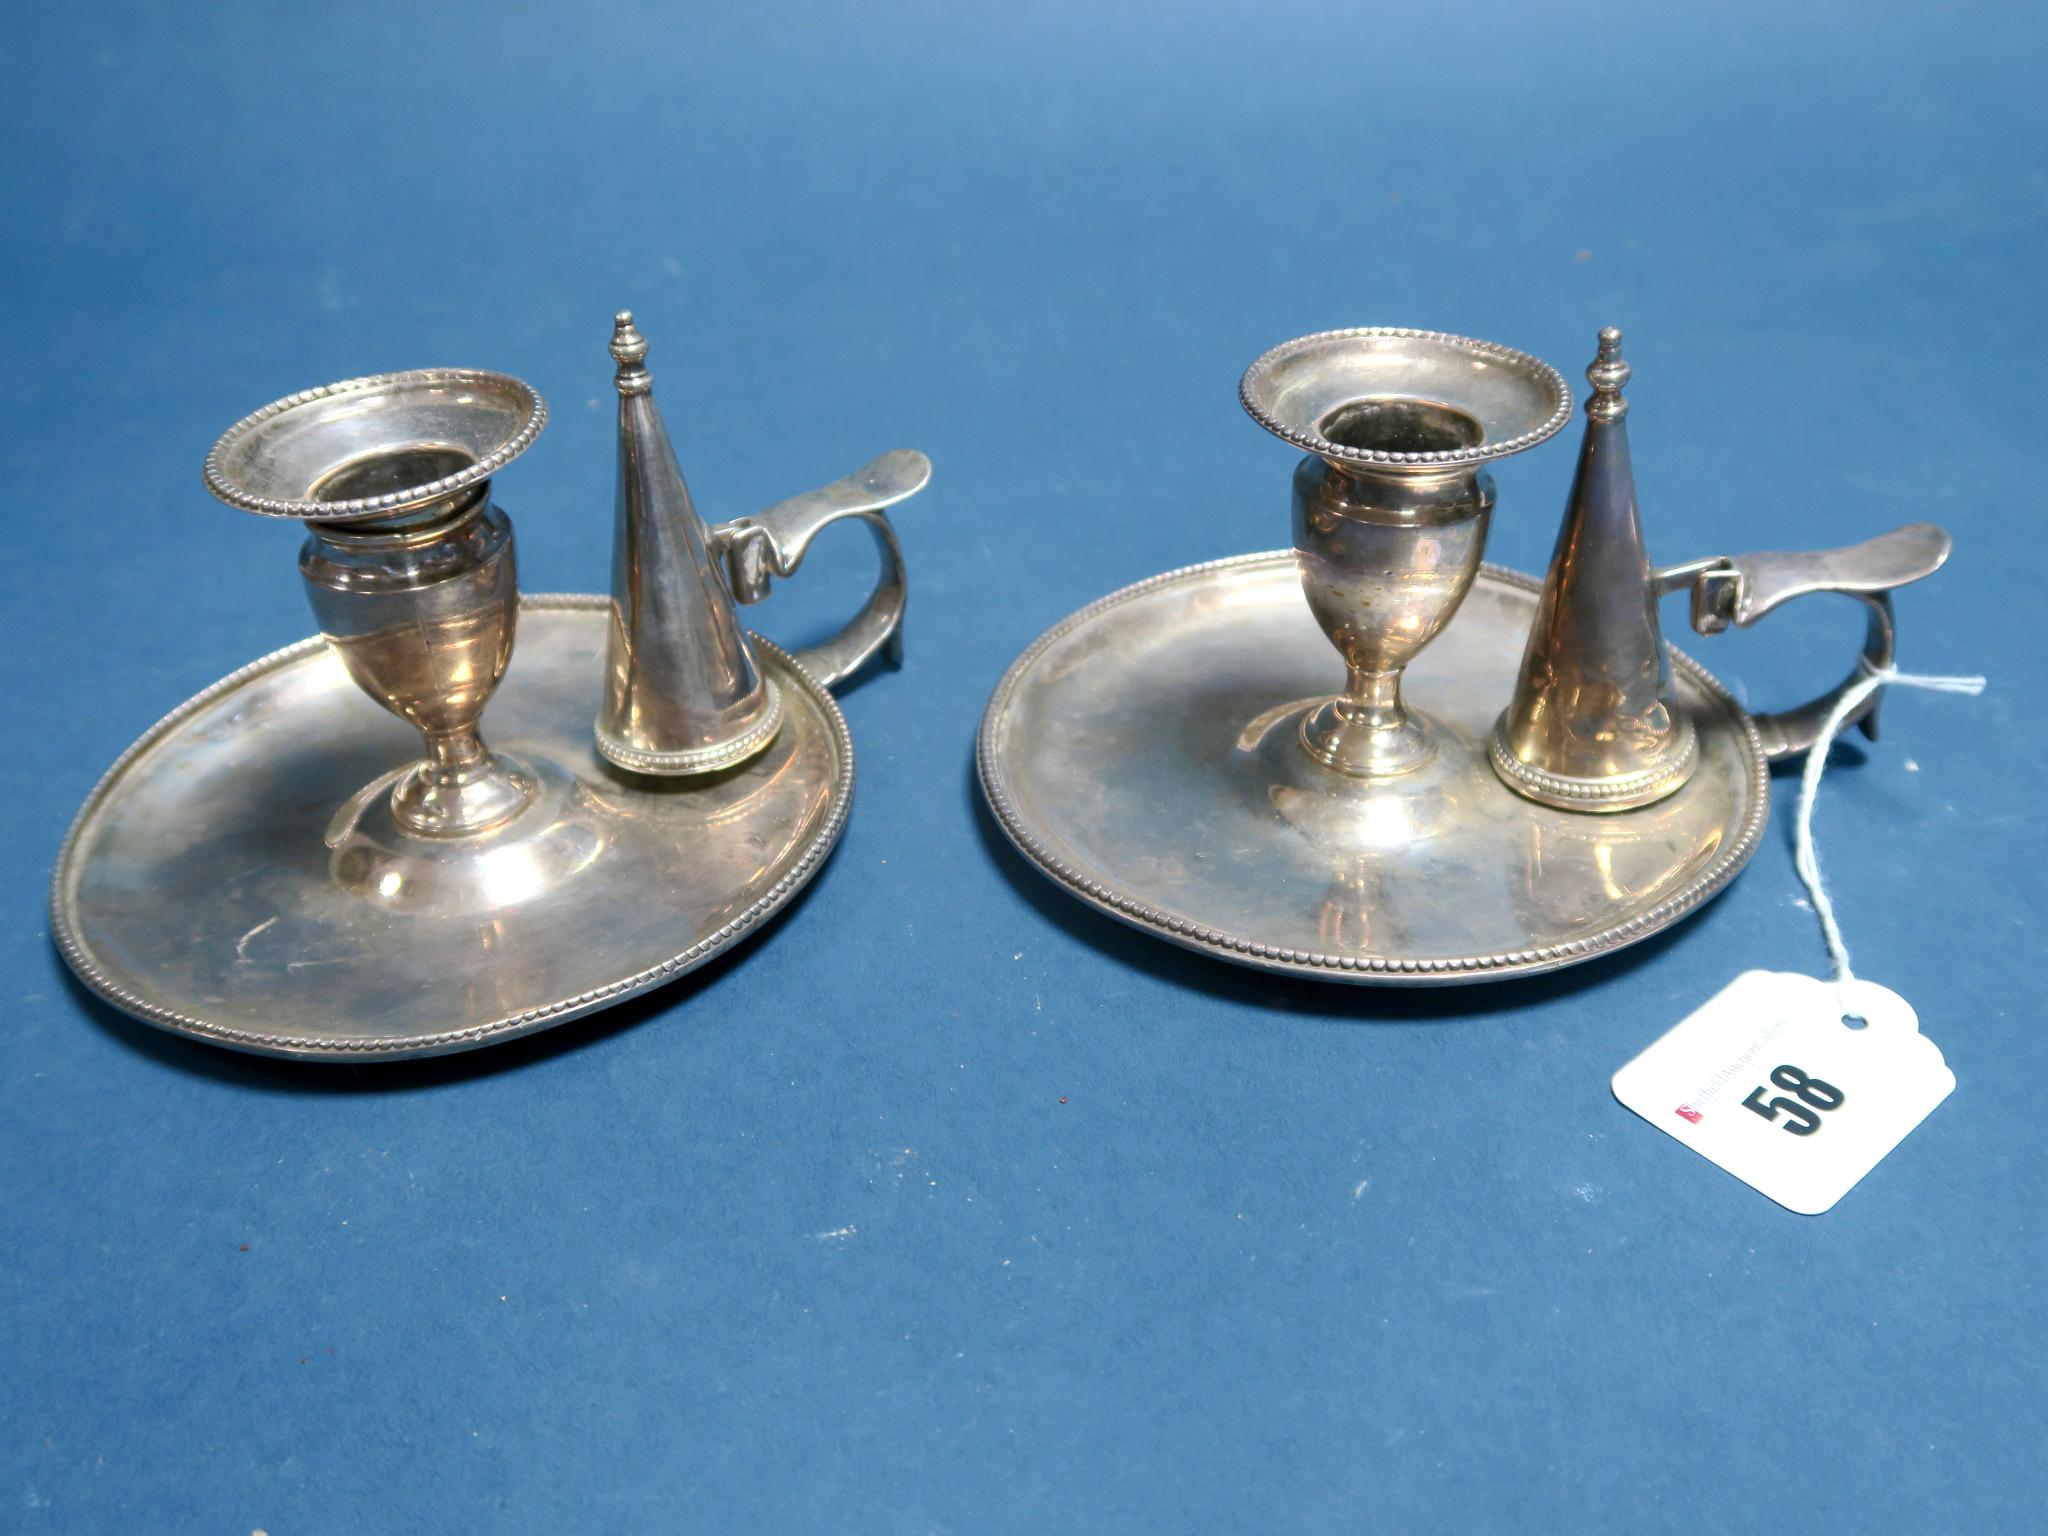 Lot 58 - A Matched Pair of Hallmarked Silver Chambersticks, J.A, London 1818, 1819, each of plain design,